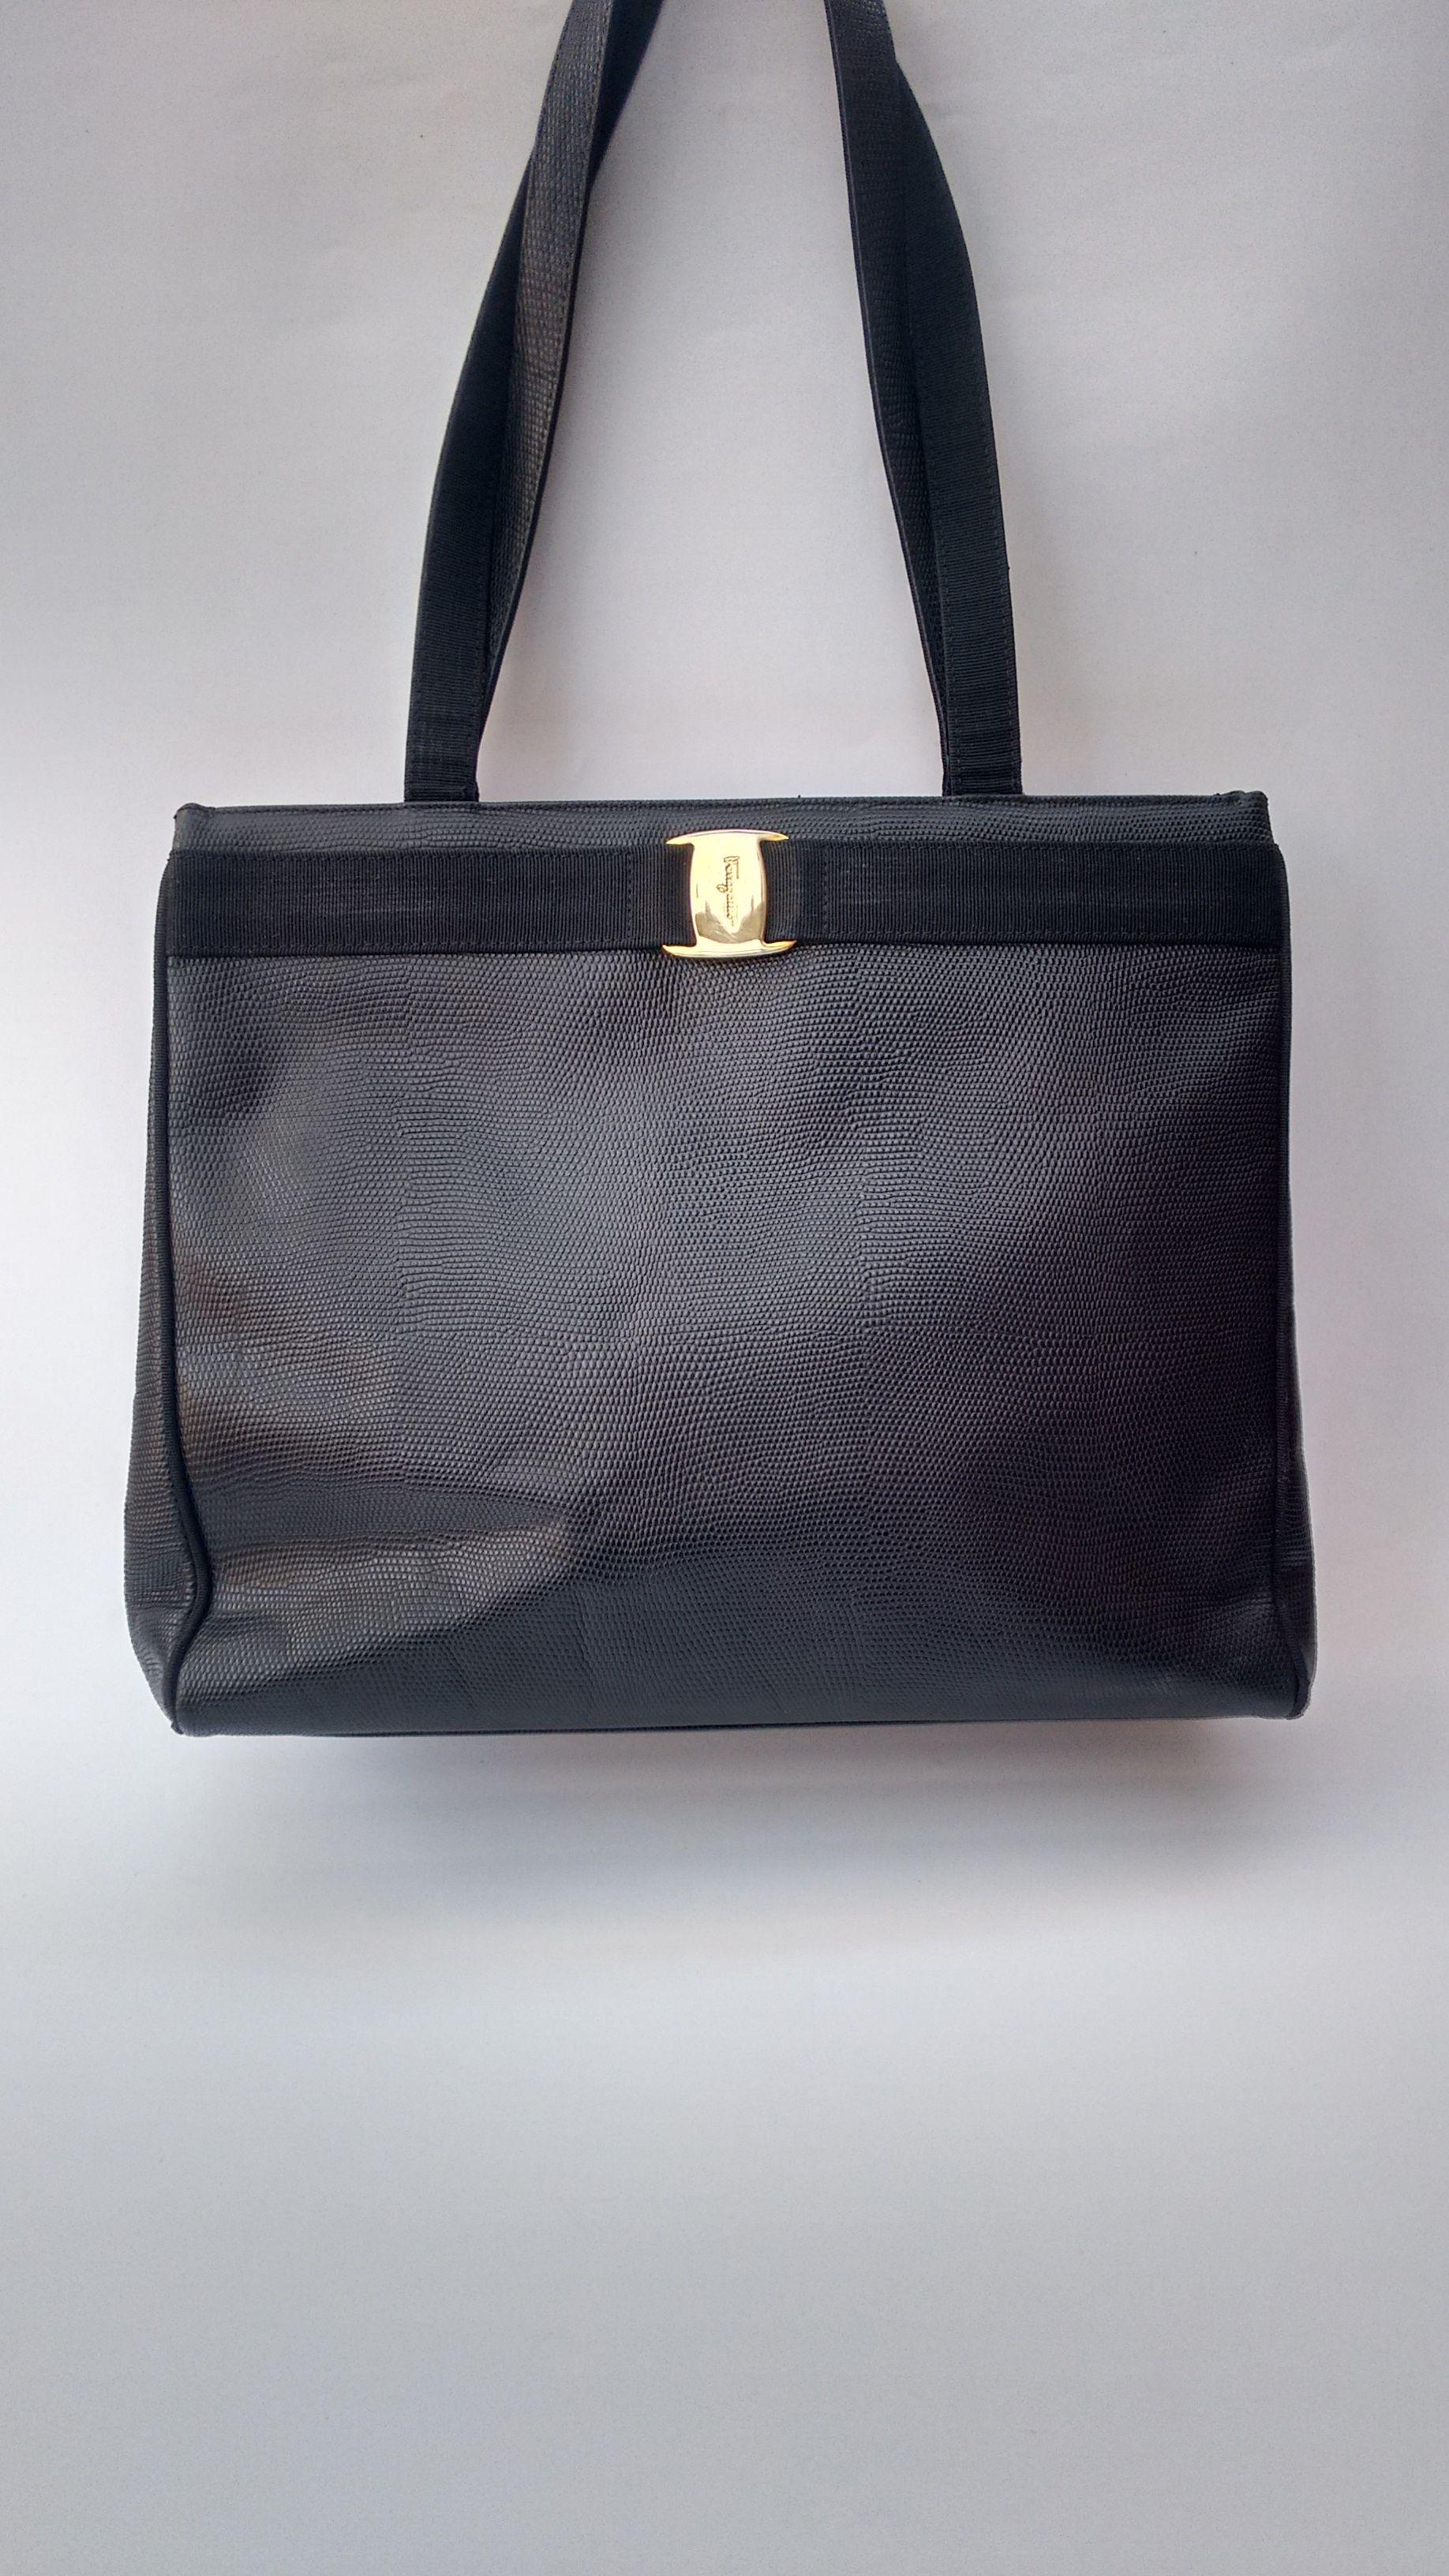 SALVATORE FERRAGAMO Vintage Black Textured Lizard Embossed Leather Shoulder  Tote Bag. Italian Designer Purse. 9571fa418b